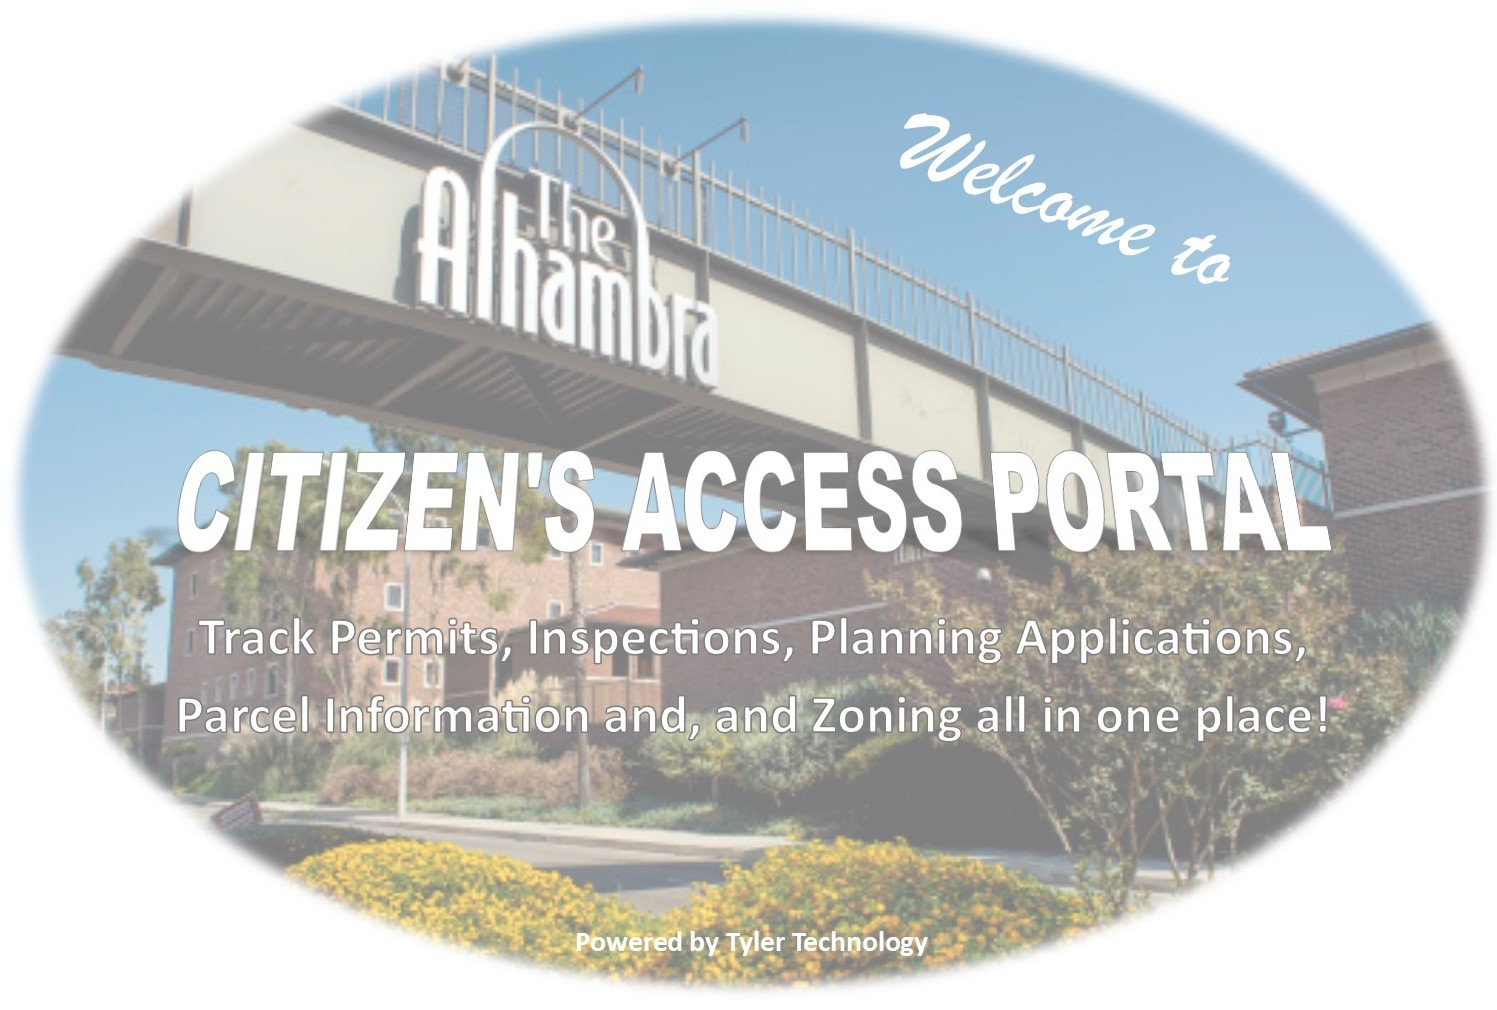 https://www.cityofalhambra.org/resources/alhambra-citizens-access-portal